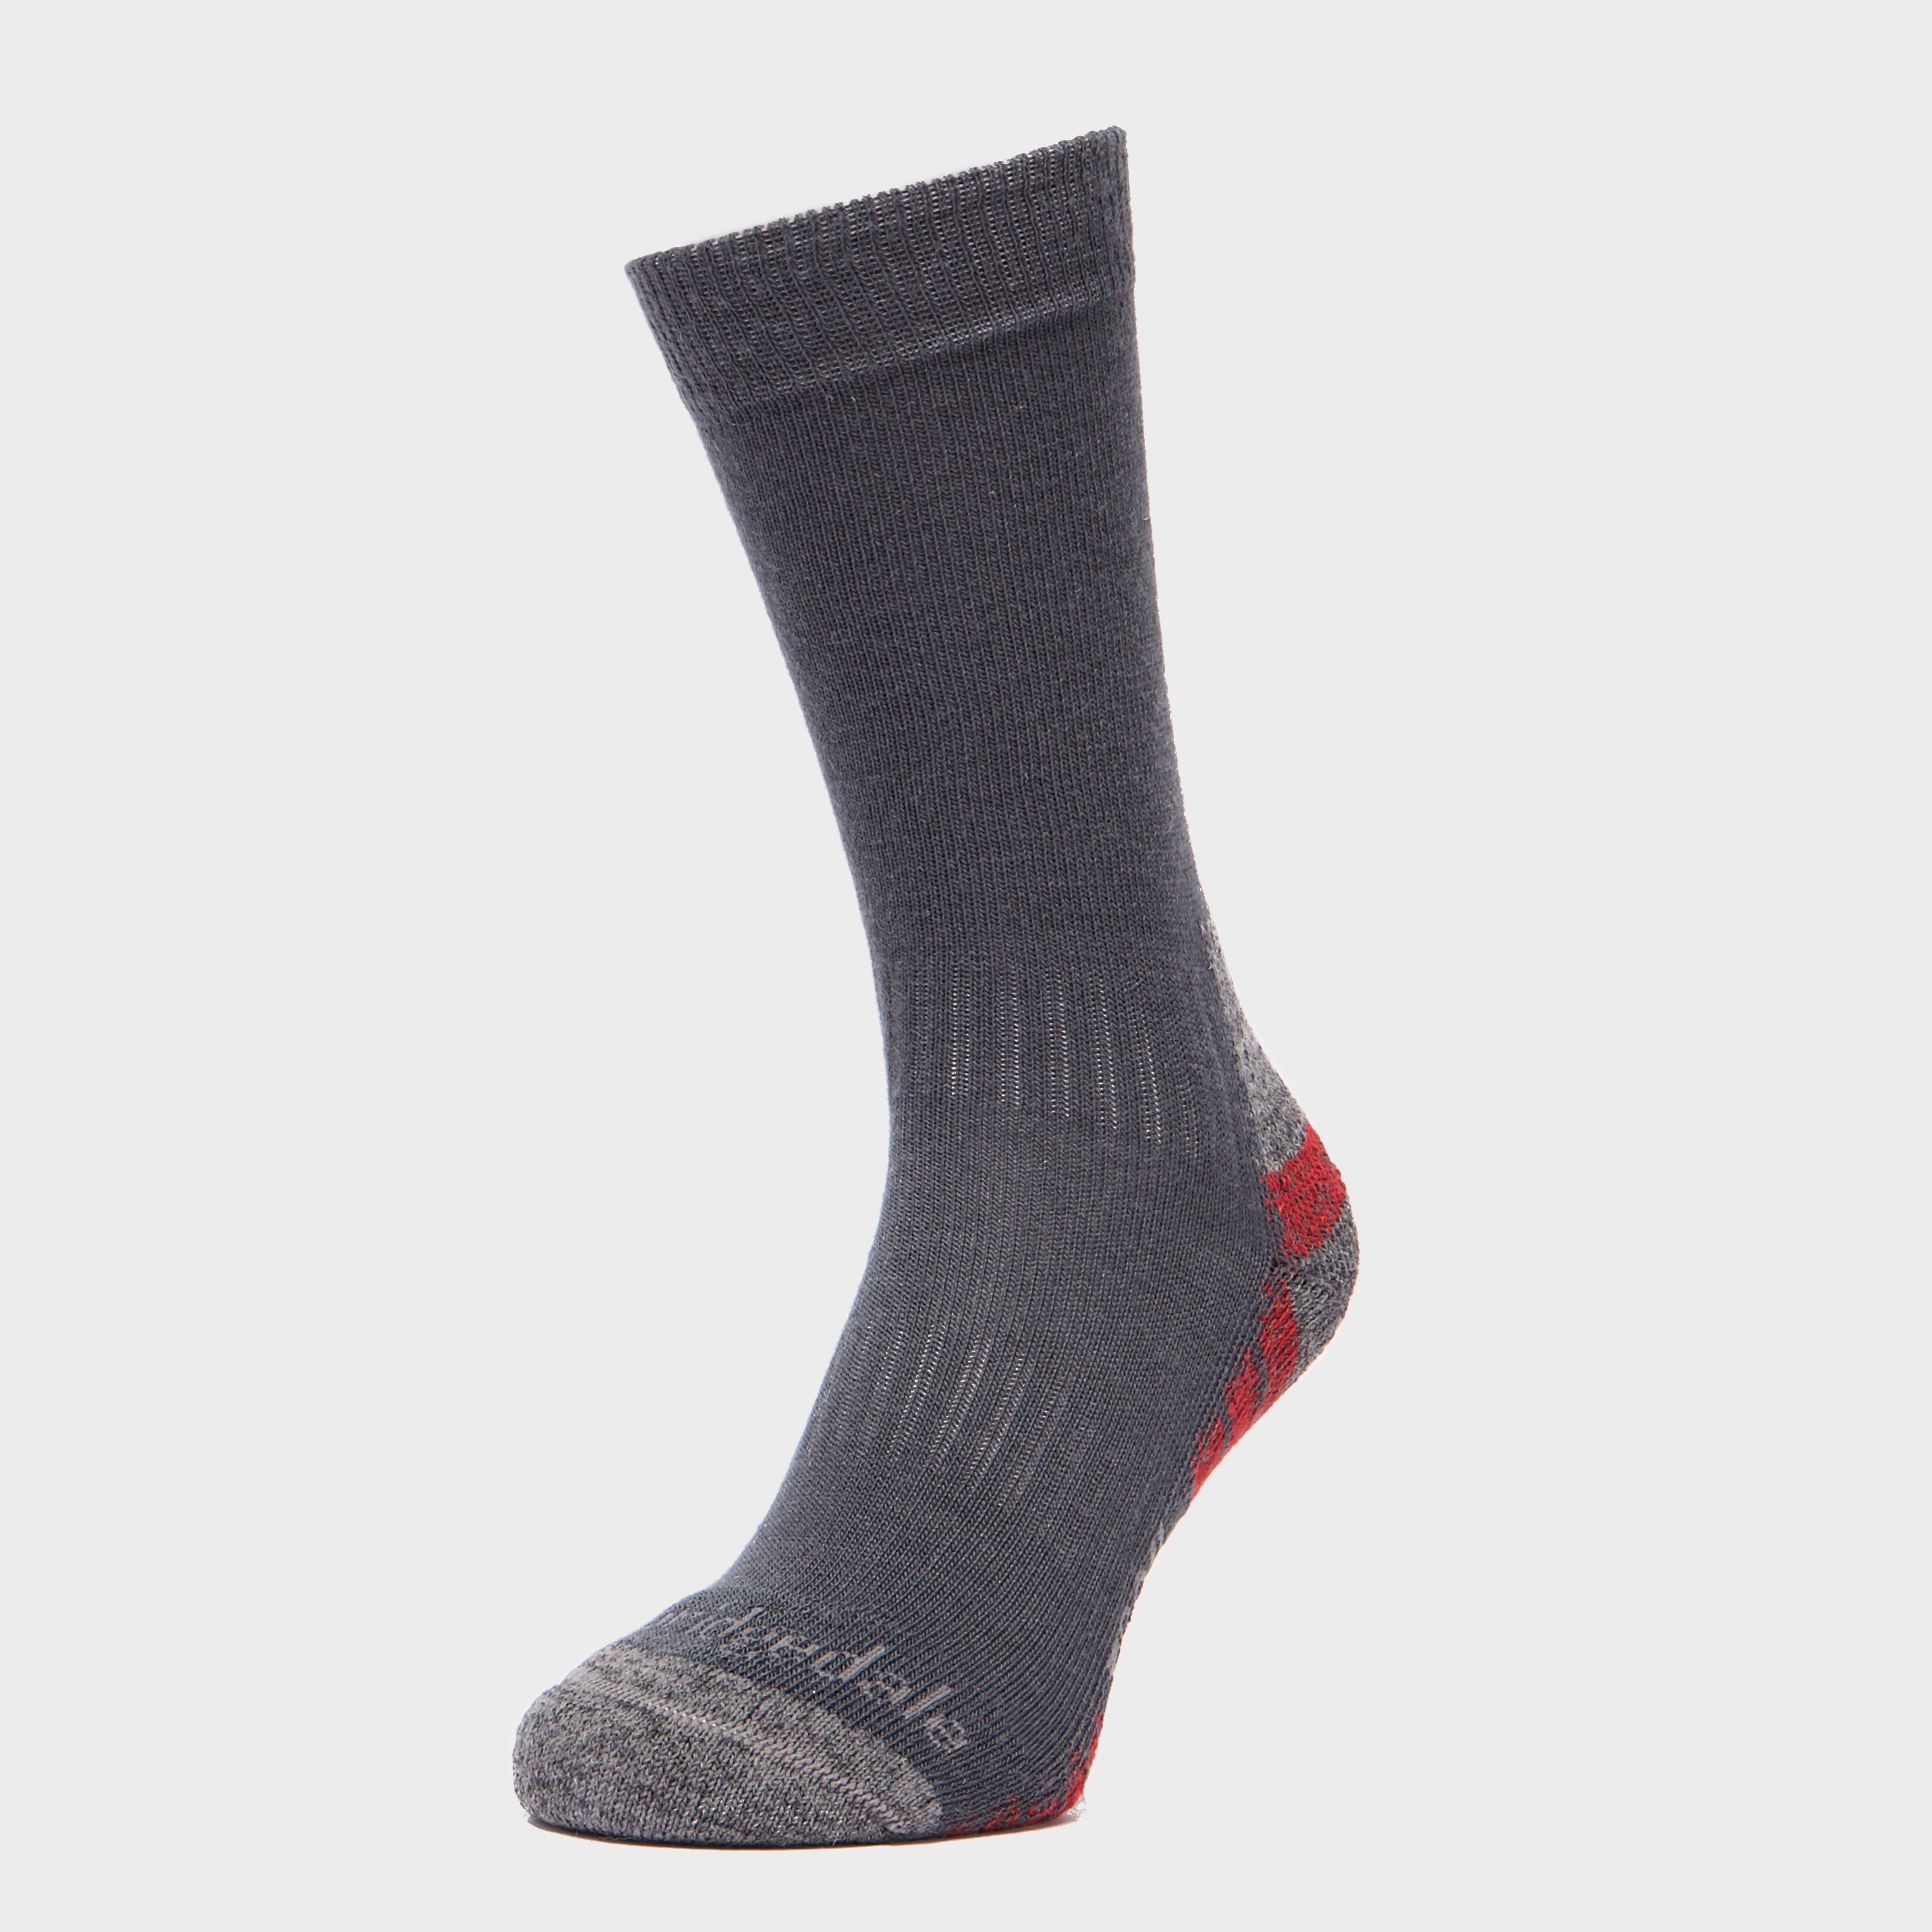 new style fd42c 0d288 Men's WoolFusion® Trail Ultra Light Socks